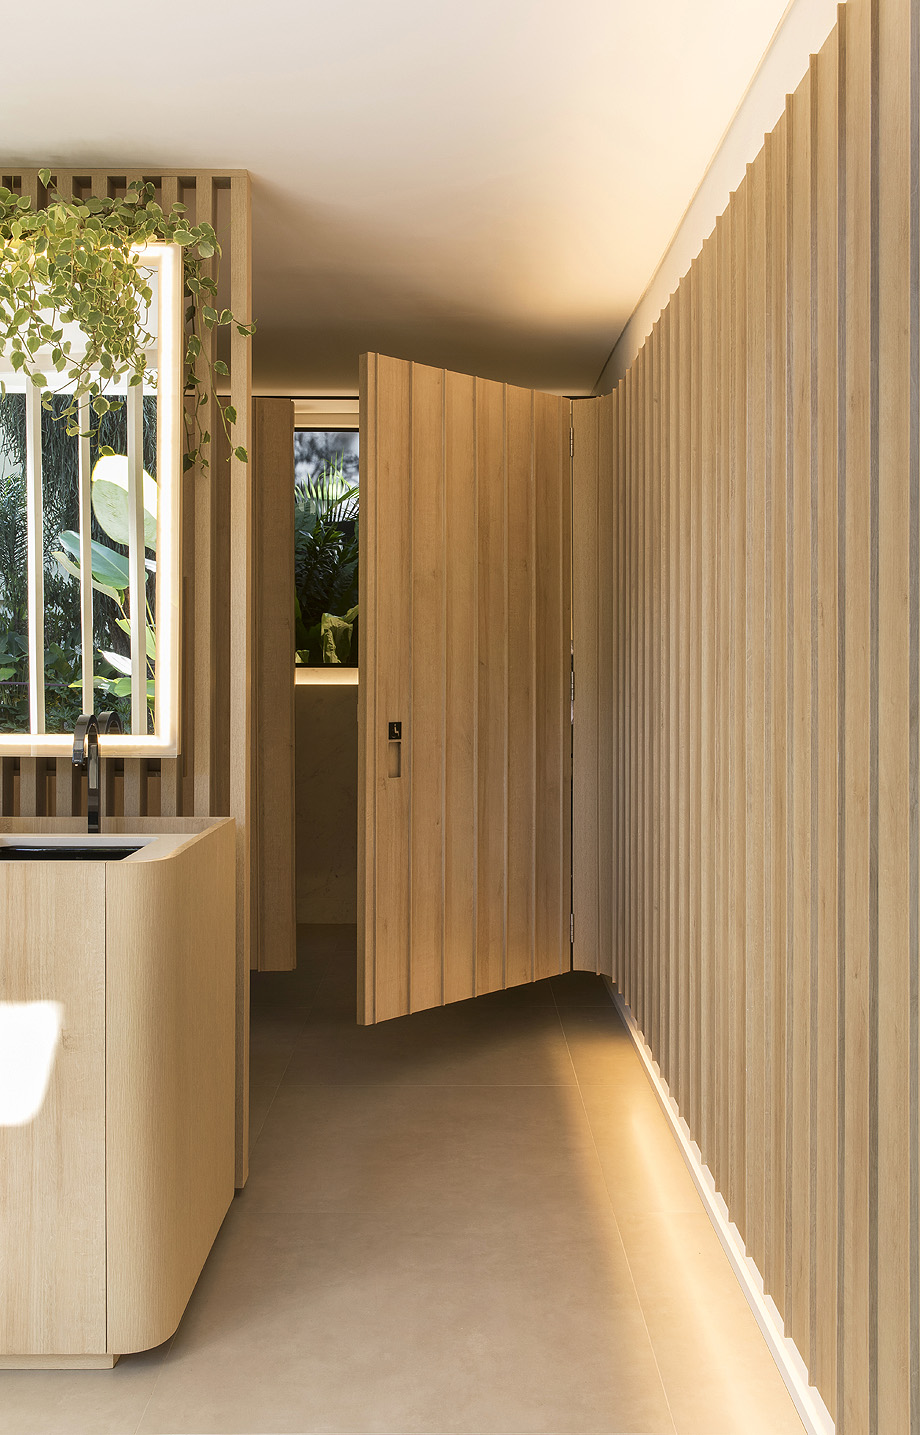 recinto do bosque de gdl arquitectura - foto felipe araujo (8)